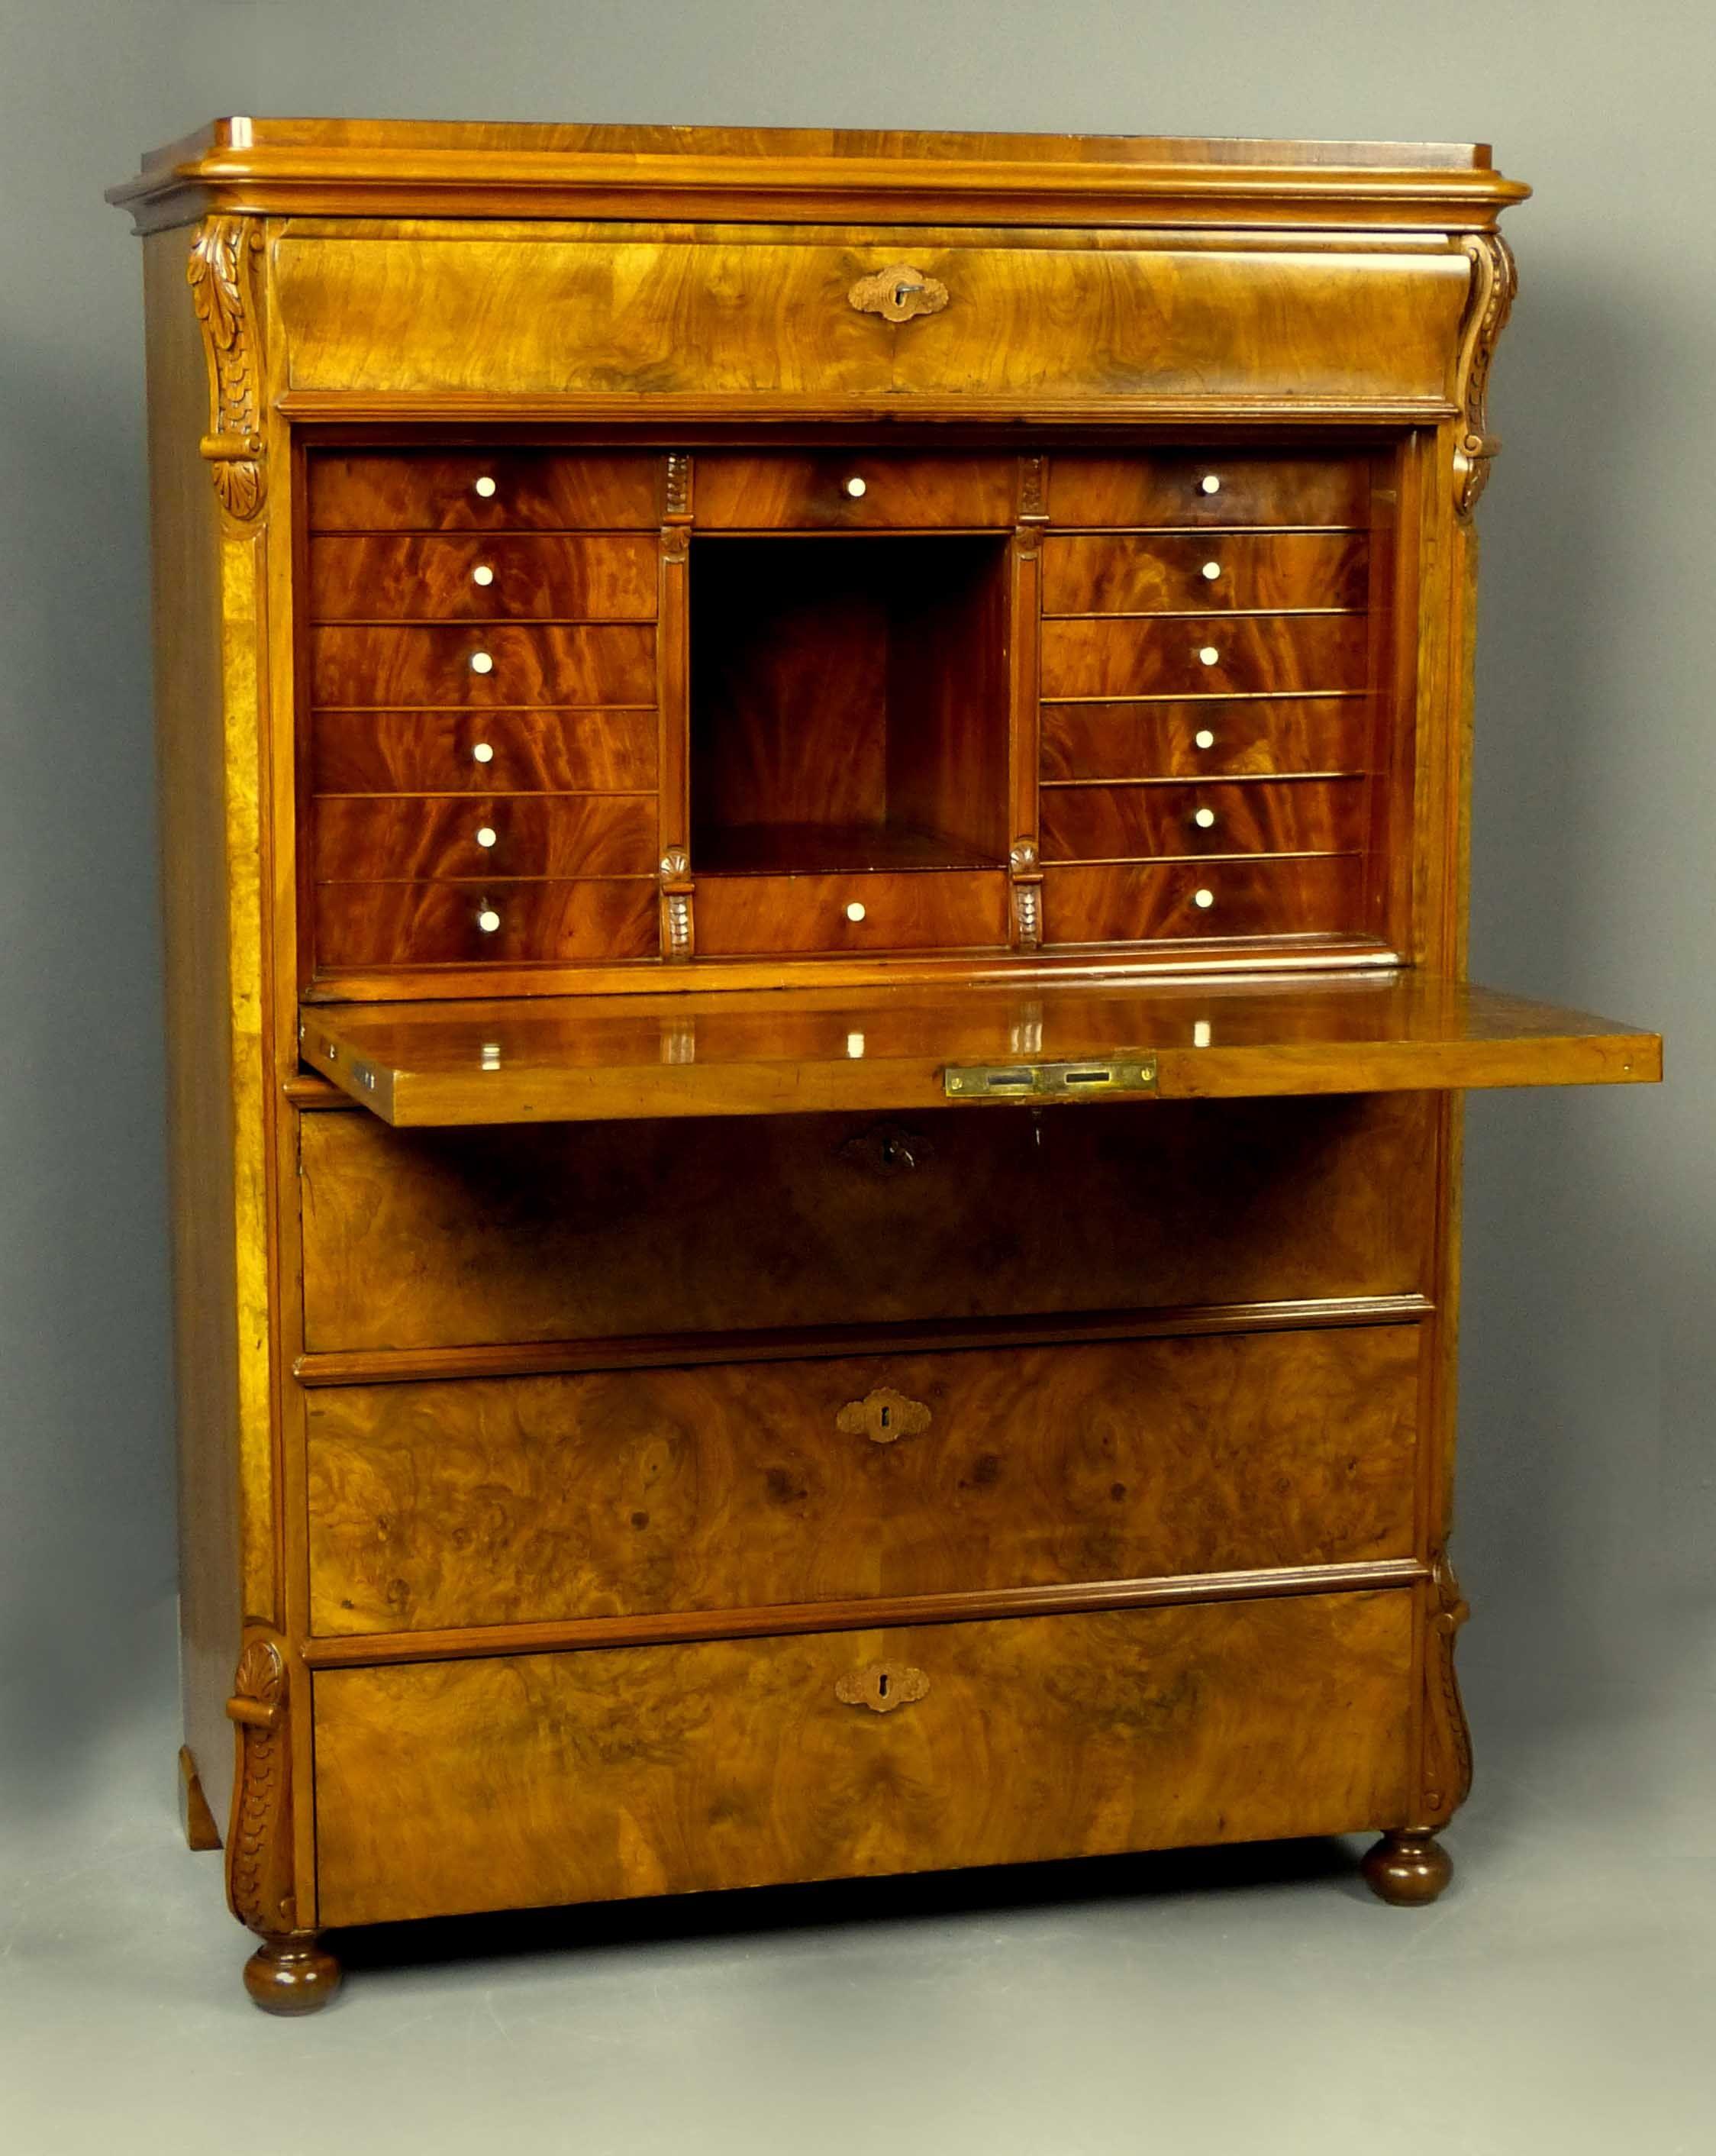 secretaire a abattant recherche google secretary antiqe pinterest muebles antiguos y madera. Black Bedroom Furniture Sets. Home Design Ideas